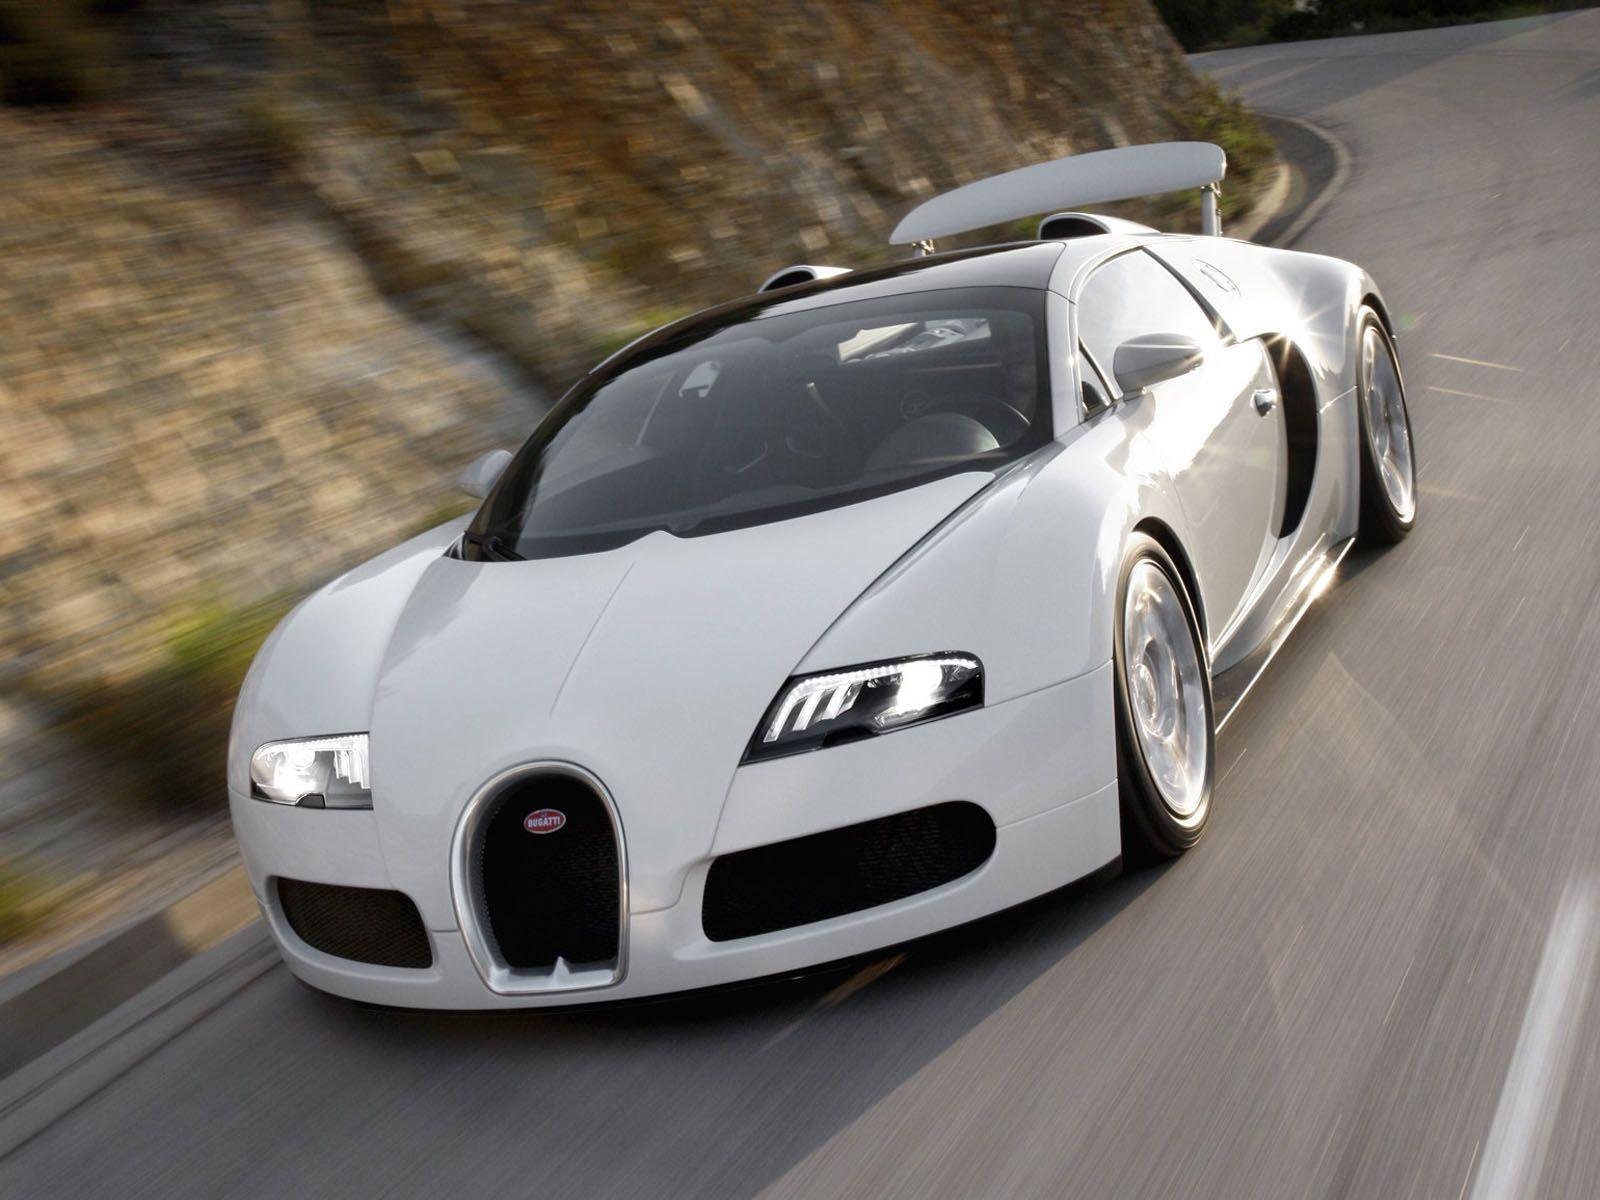 51d94c84888debcd1ddceaa0b2868eec Amazing Bugatti Veyron Price In Australia Cars Trend